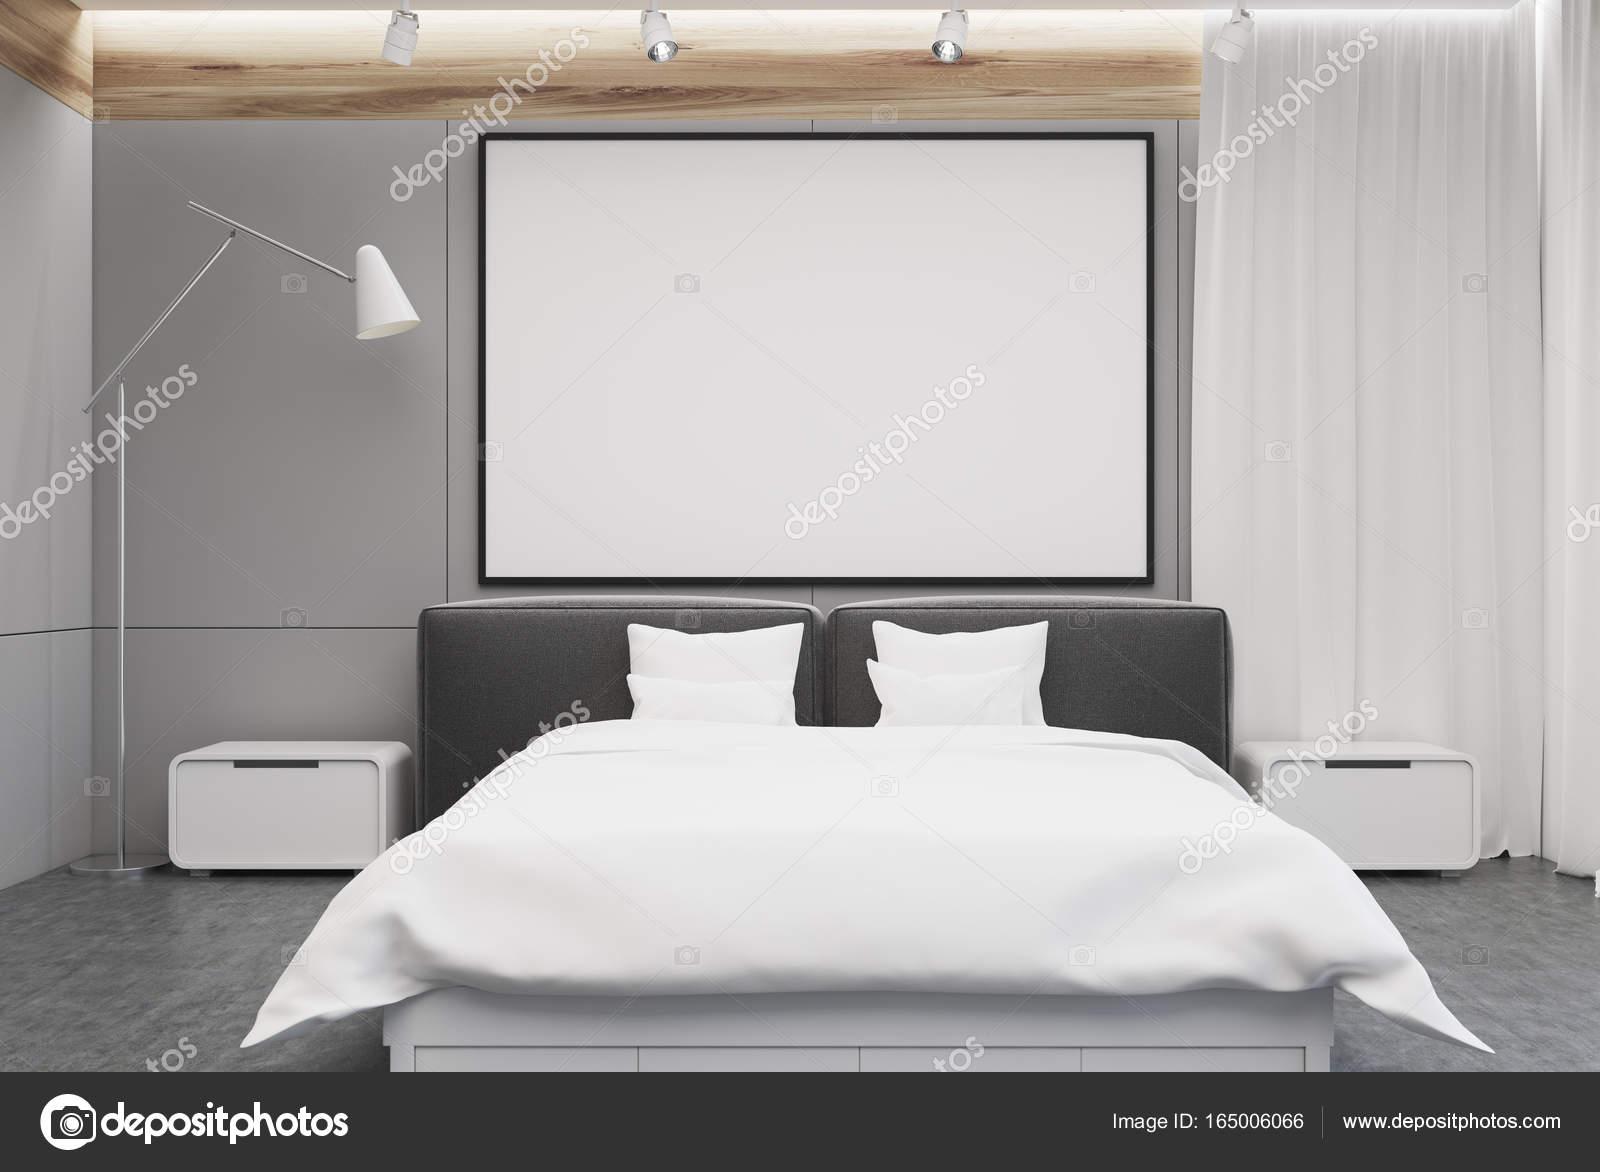 Grijs Wit Slaapkamer : Grijze en witte slaapkamer interieur foto u2014 stockfoto